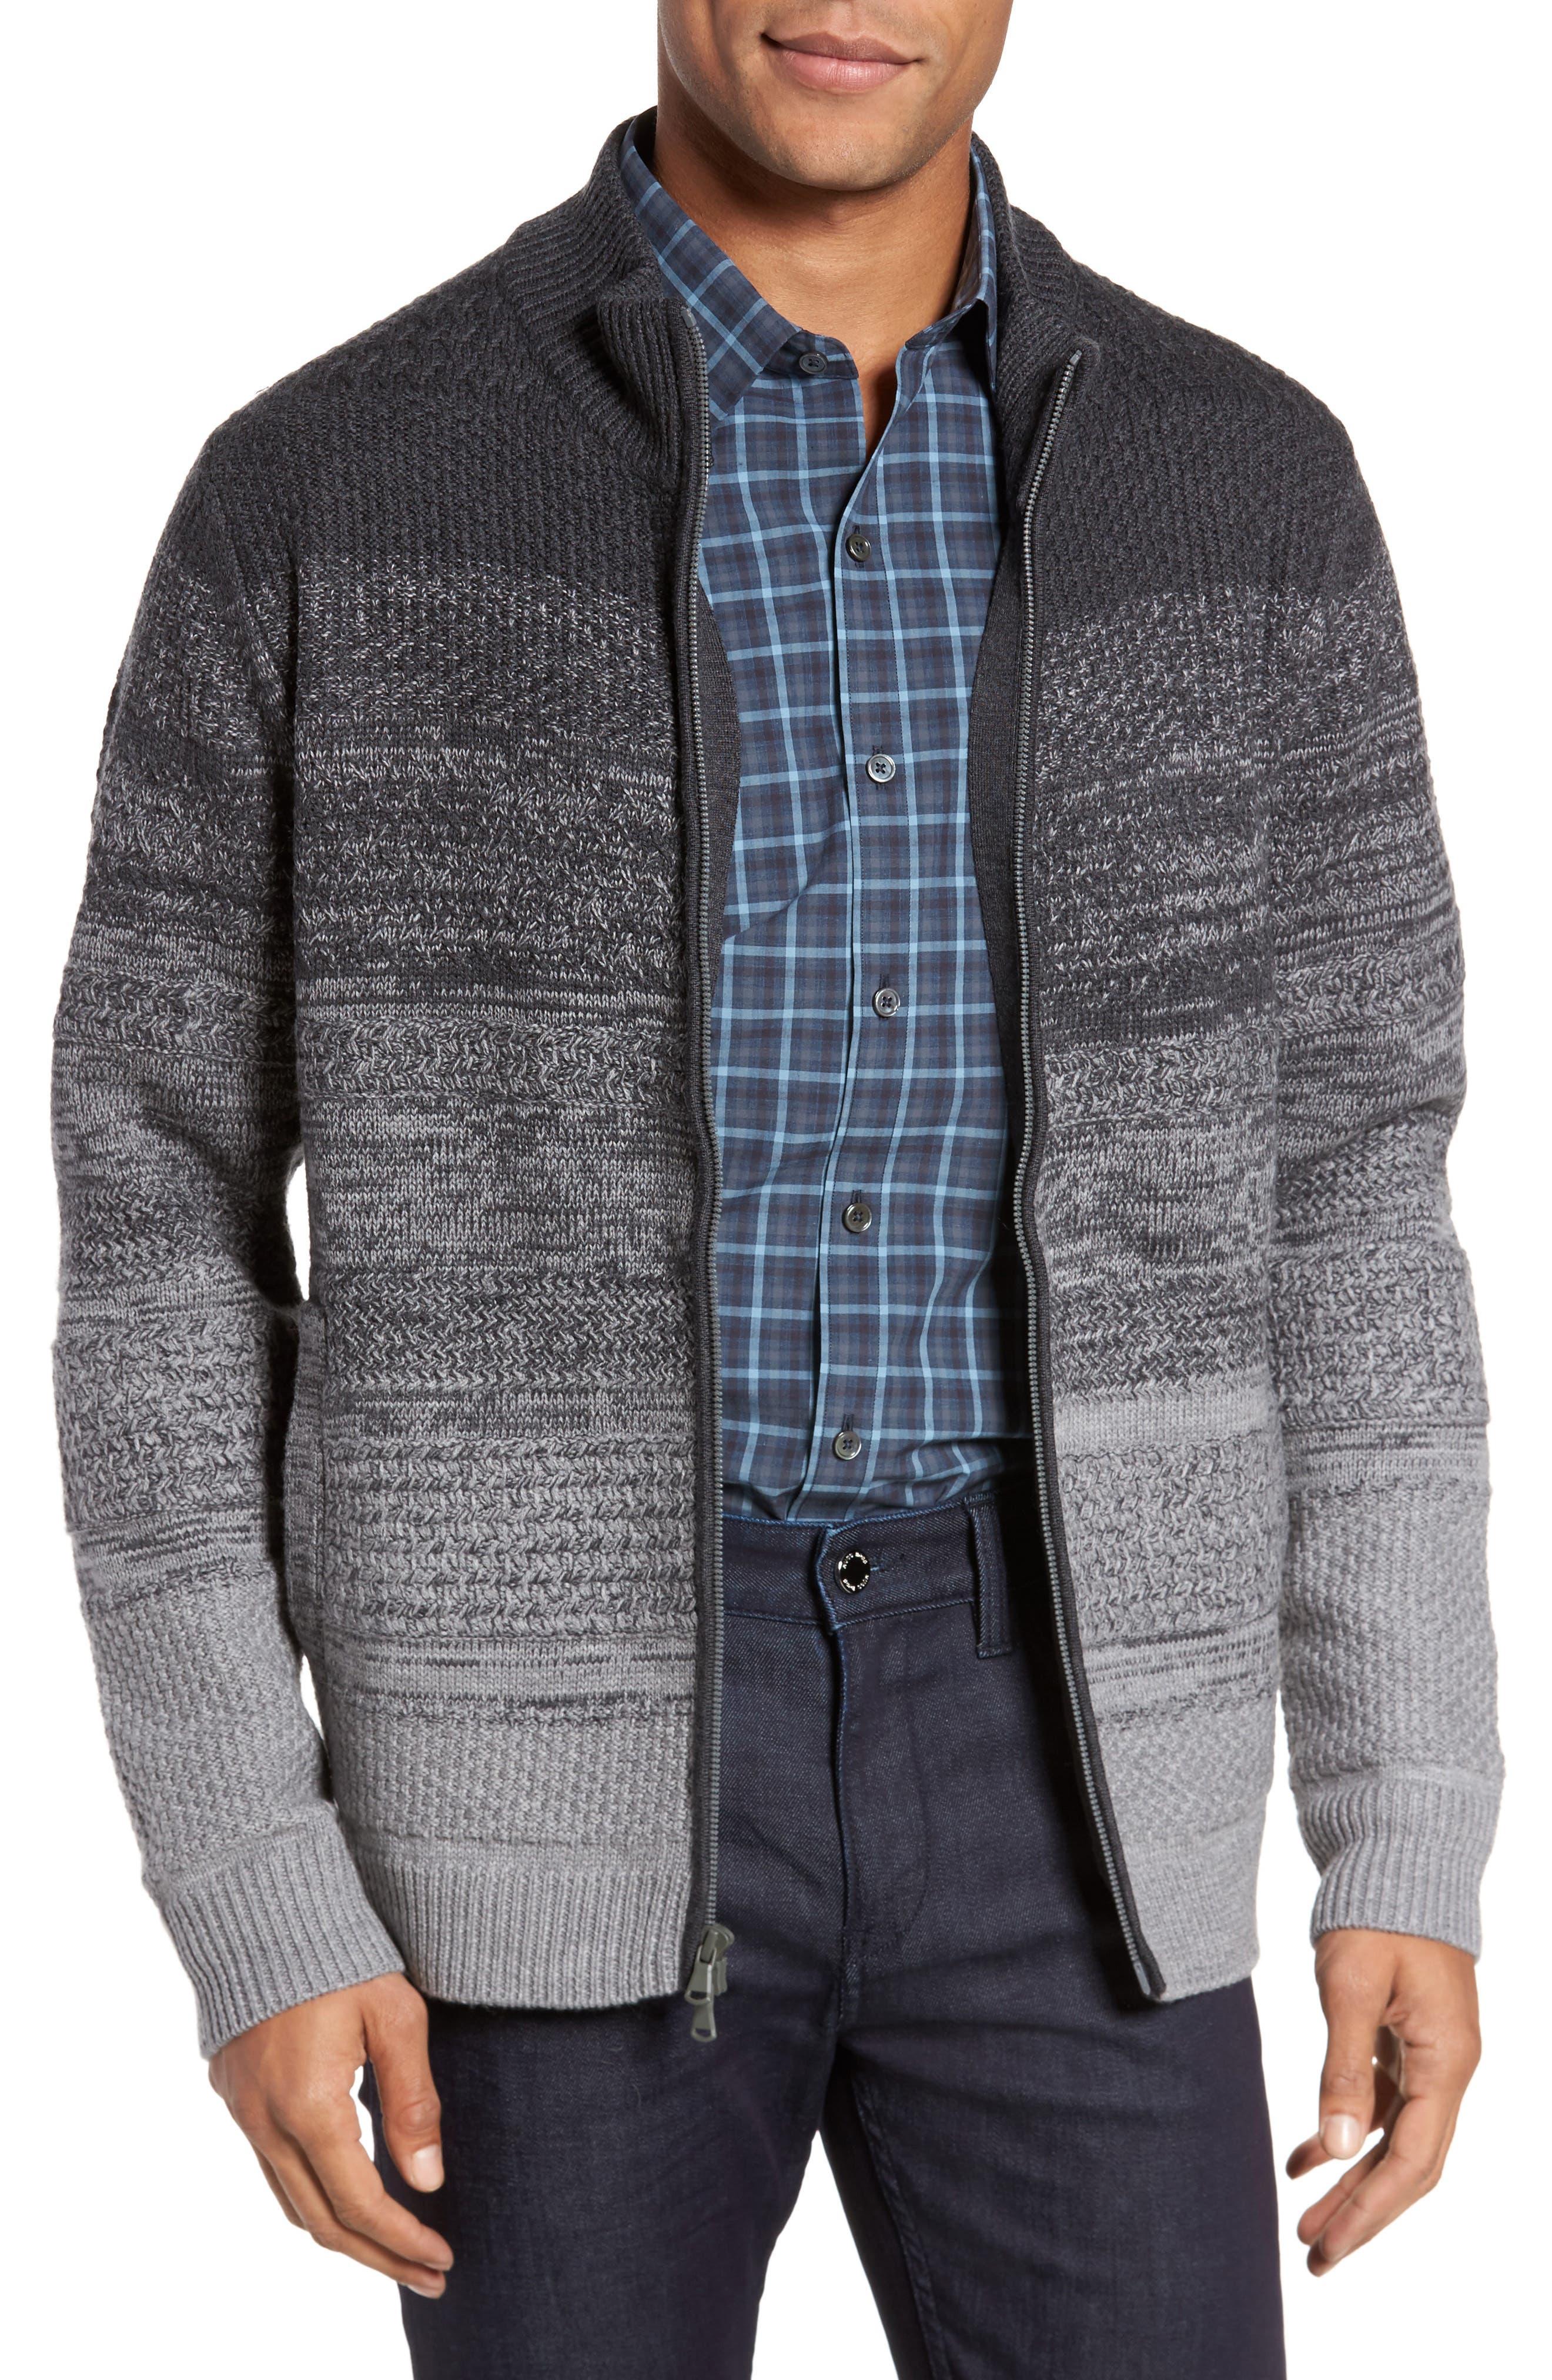 Hawkins Degrade Merino Full Zip Cardigan,                         Main,                         color, Grey